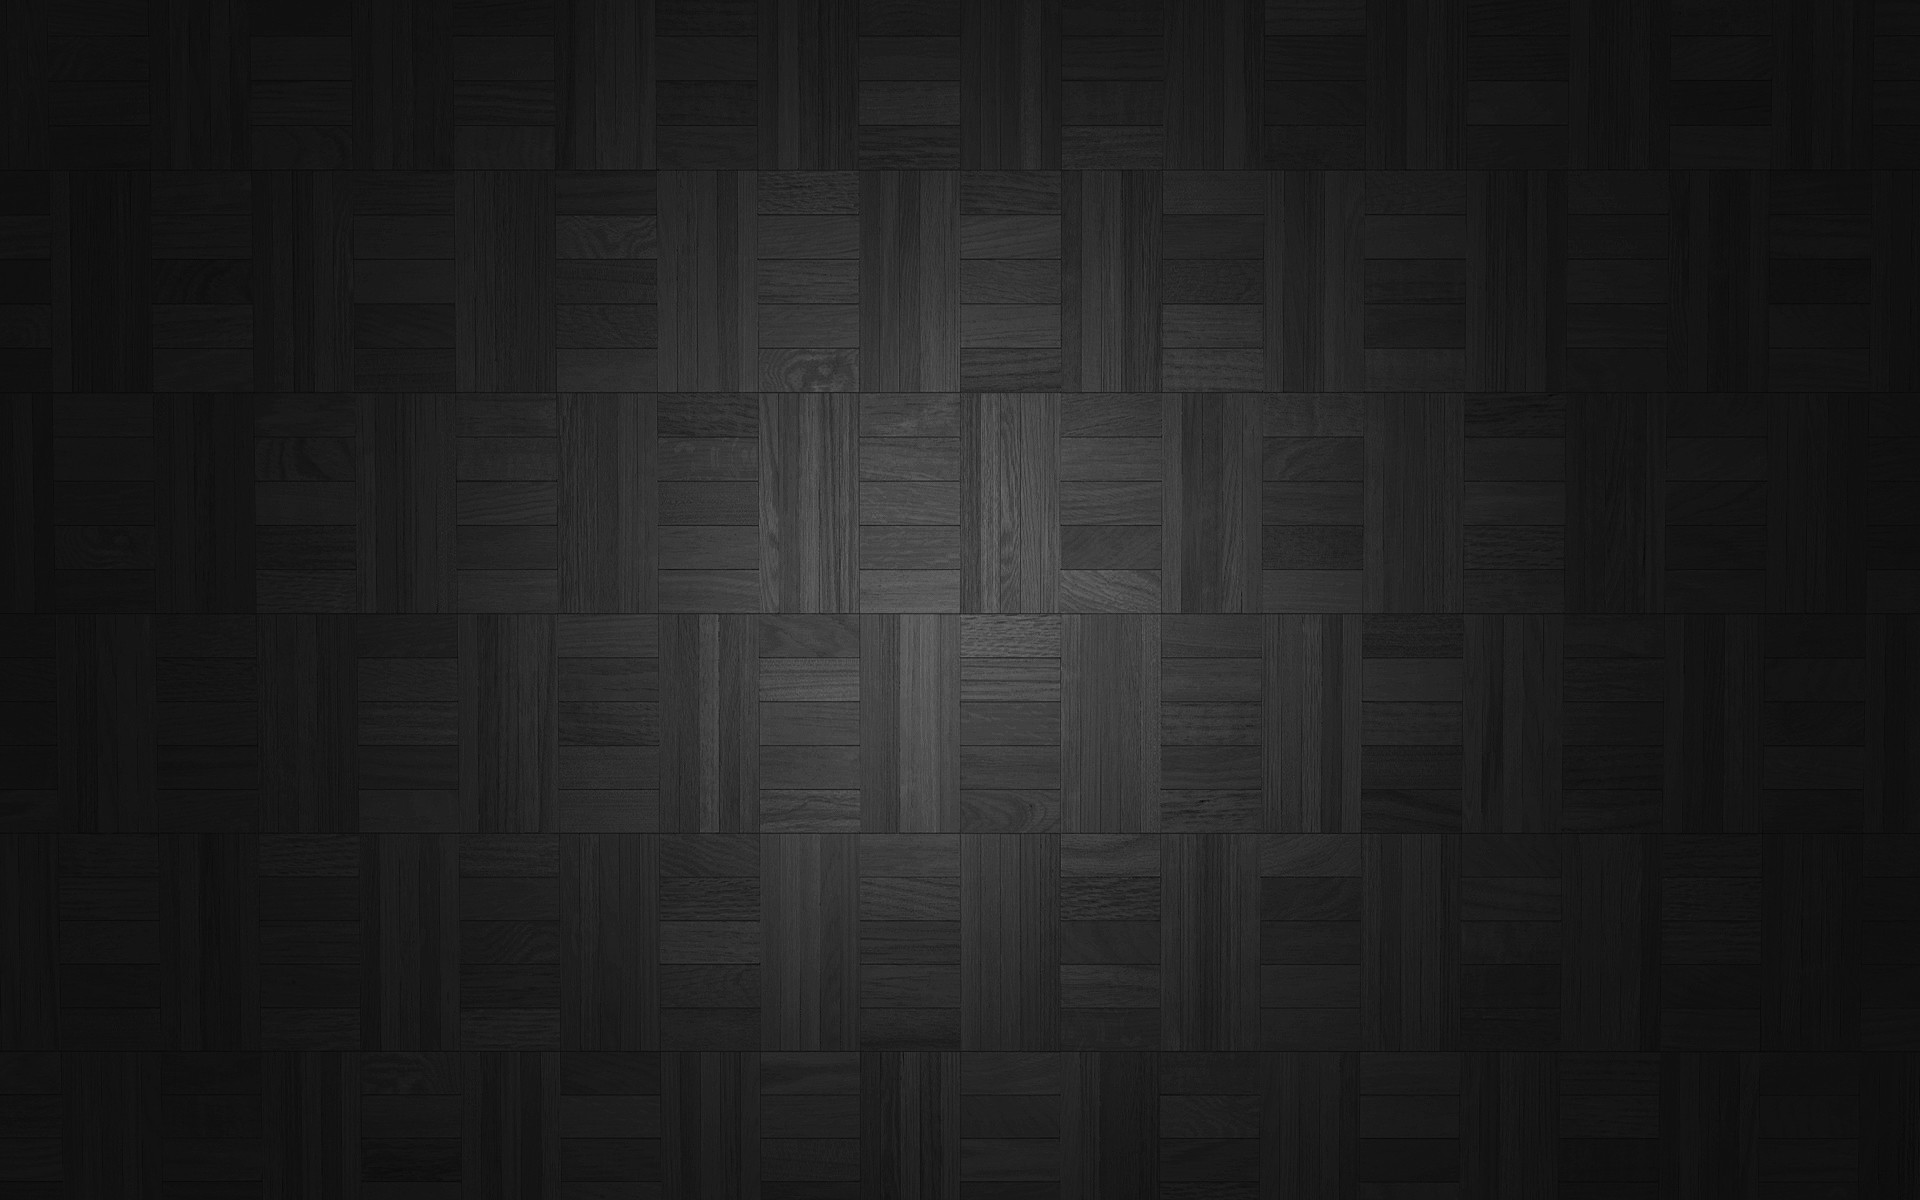 Wallpaper background, texture, dark, square, shape